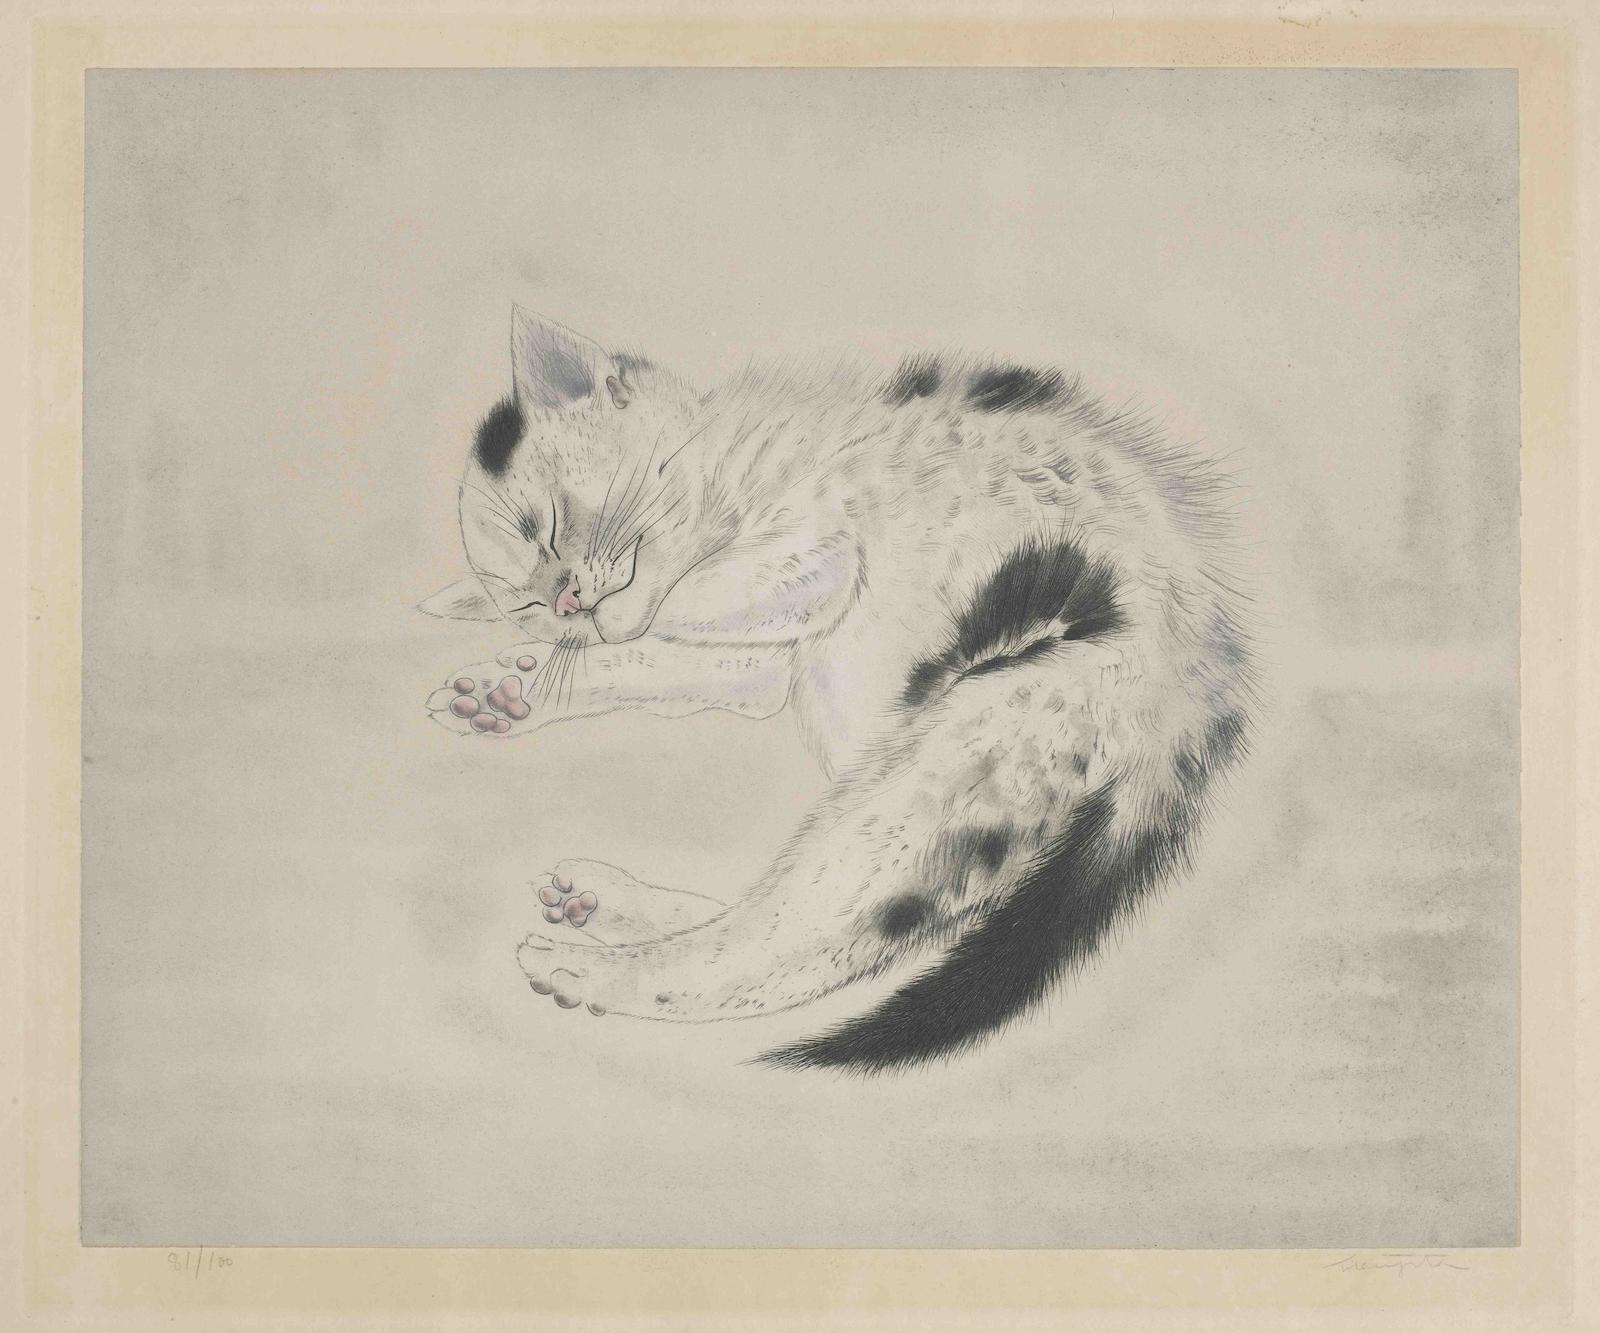 Tsuguharu Foujita-Sleeping Cat, from Les Chats (Buisson 29.200.10)-1930